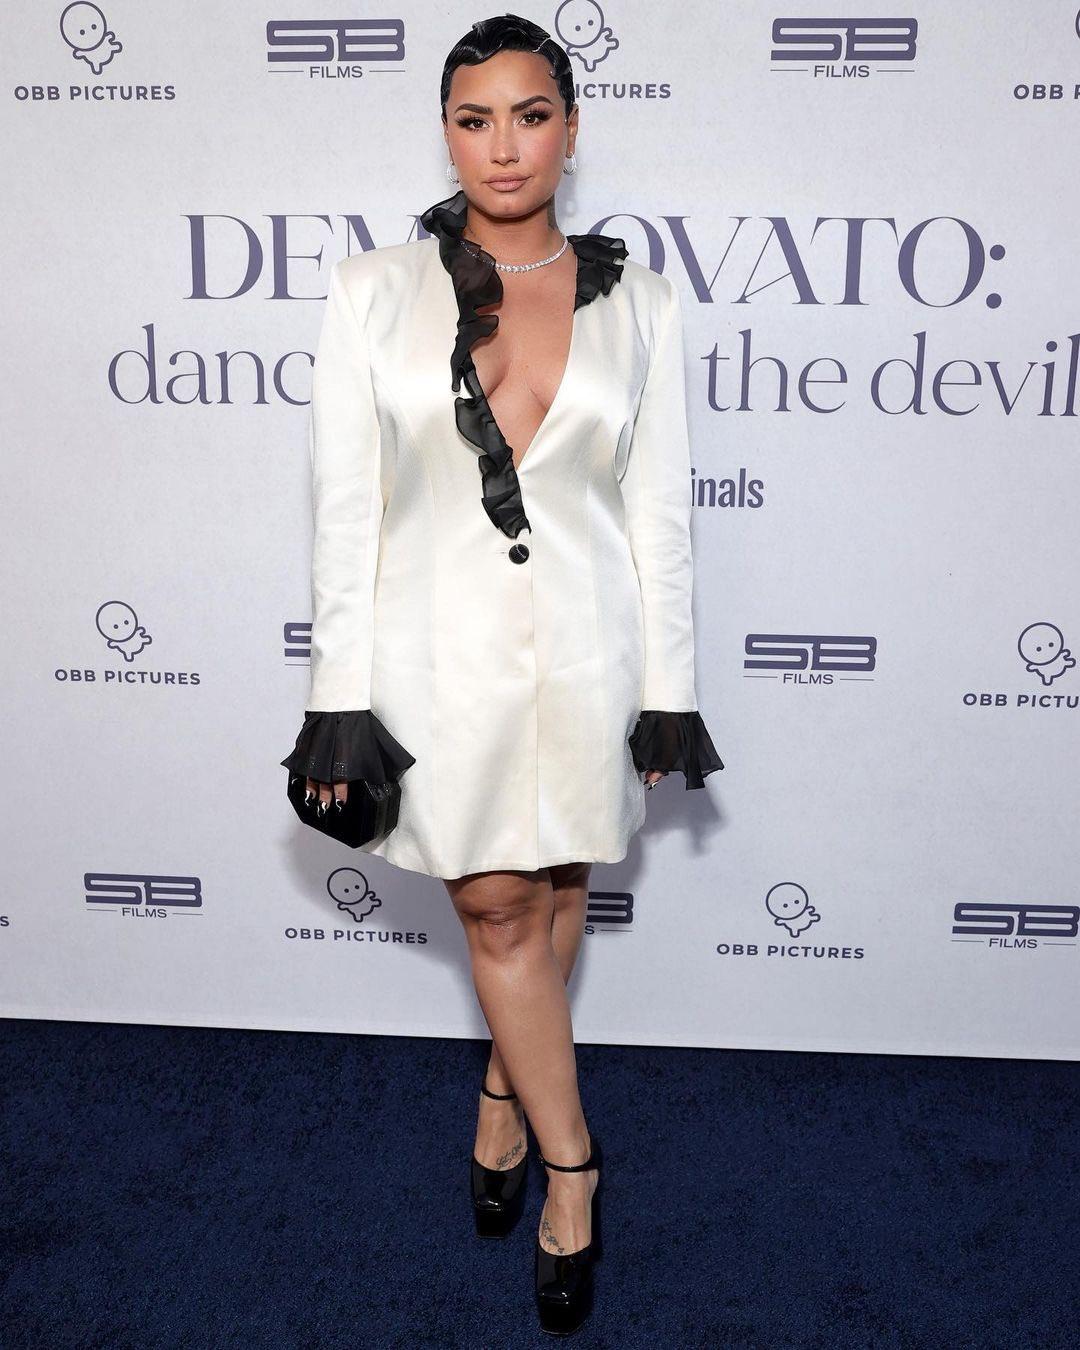 demi-lovato-wore-martin-martin-marine-dancing-with-the-devil-premiere-in-beverly-hills